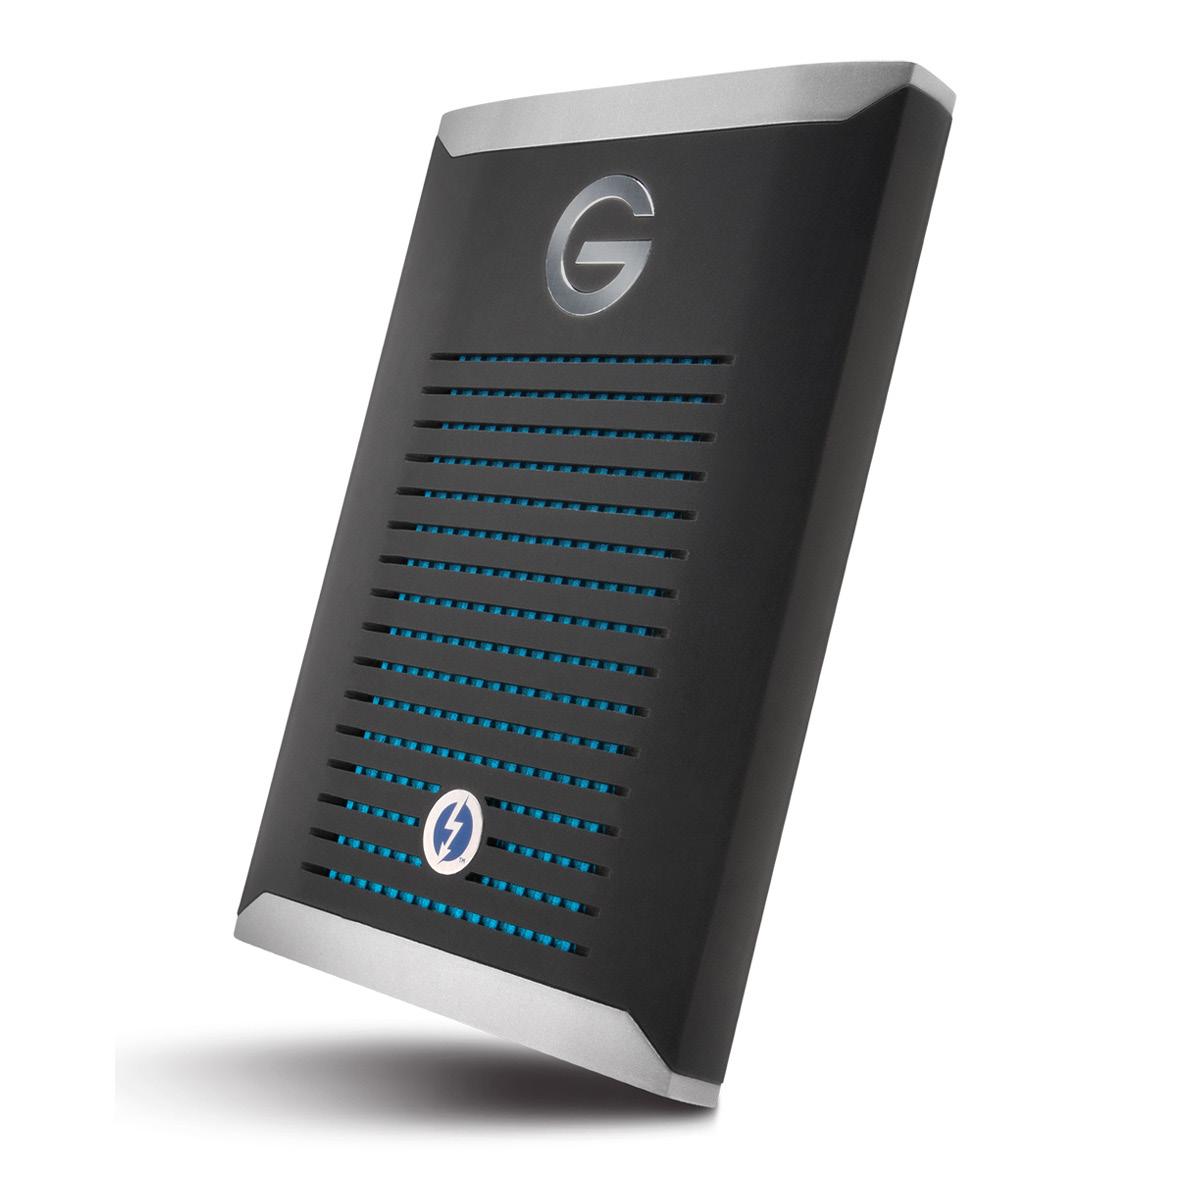 Sandisk 1 TB Professional G-Drive Pro SSD